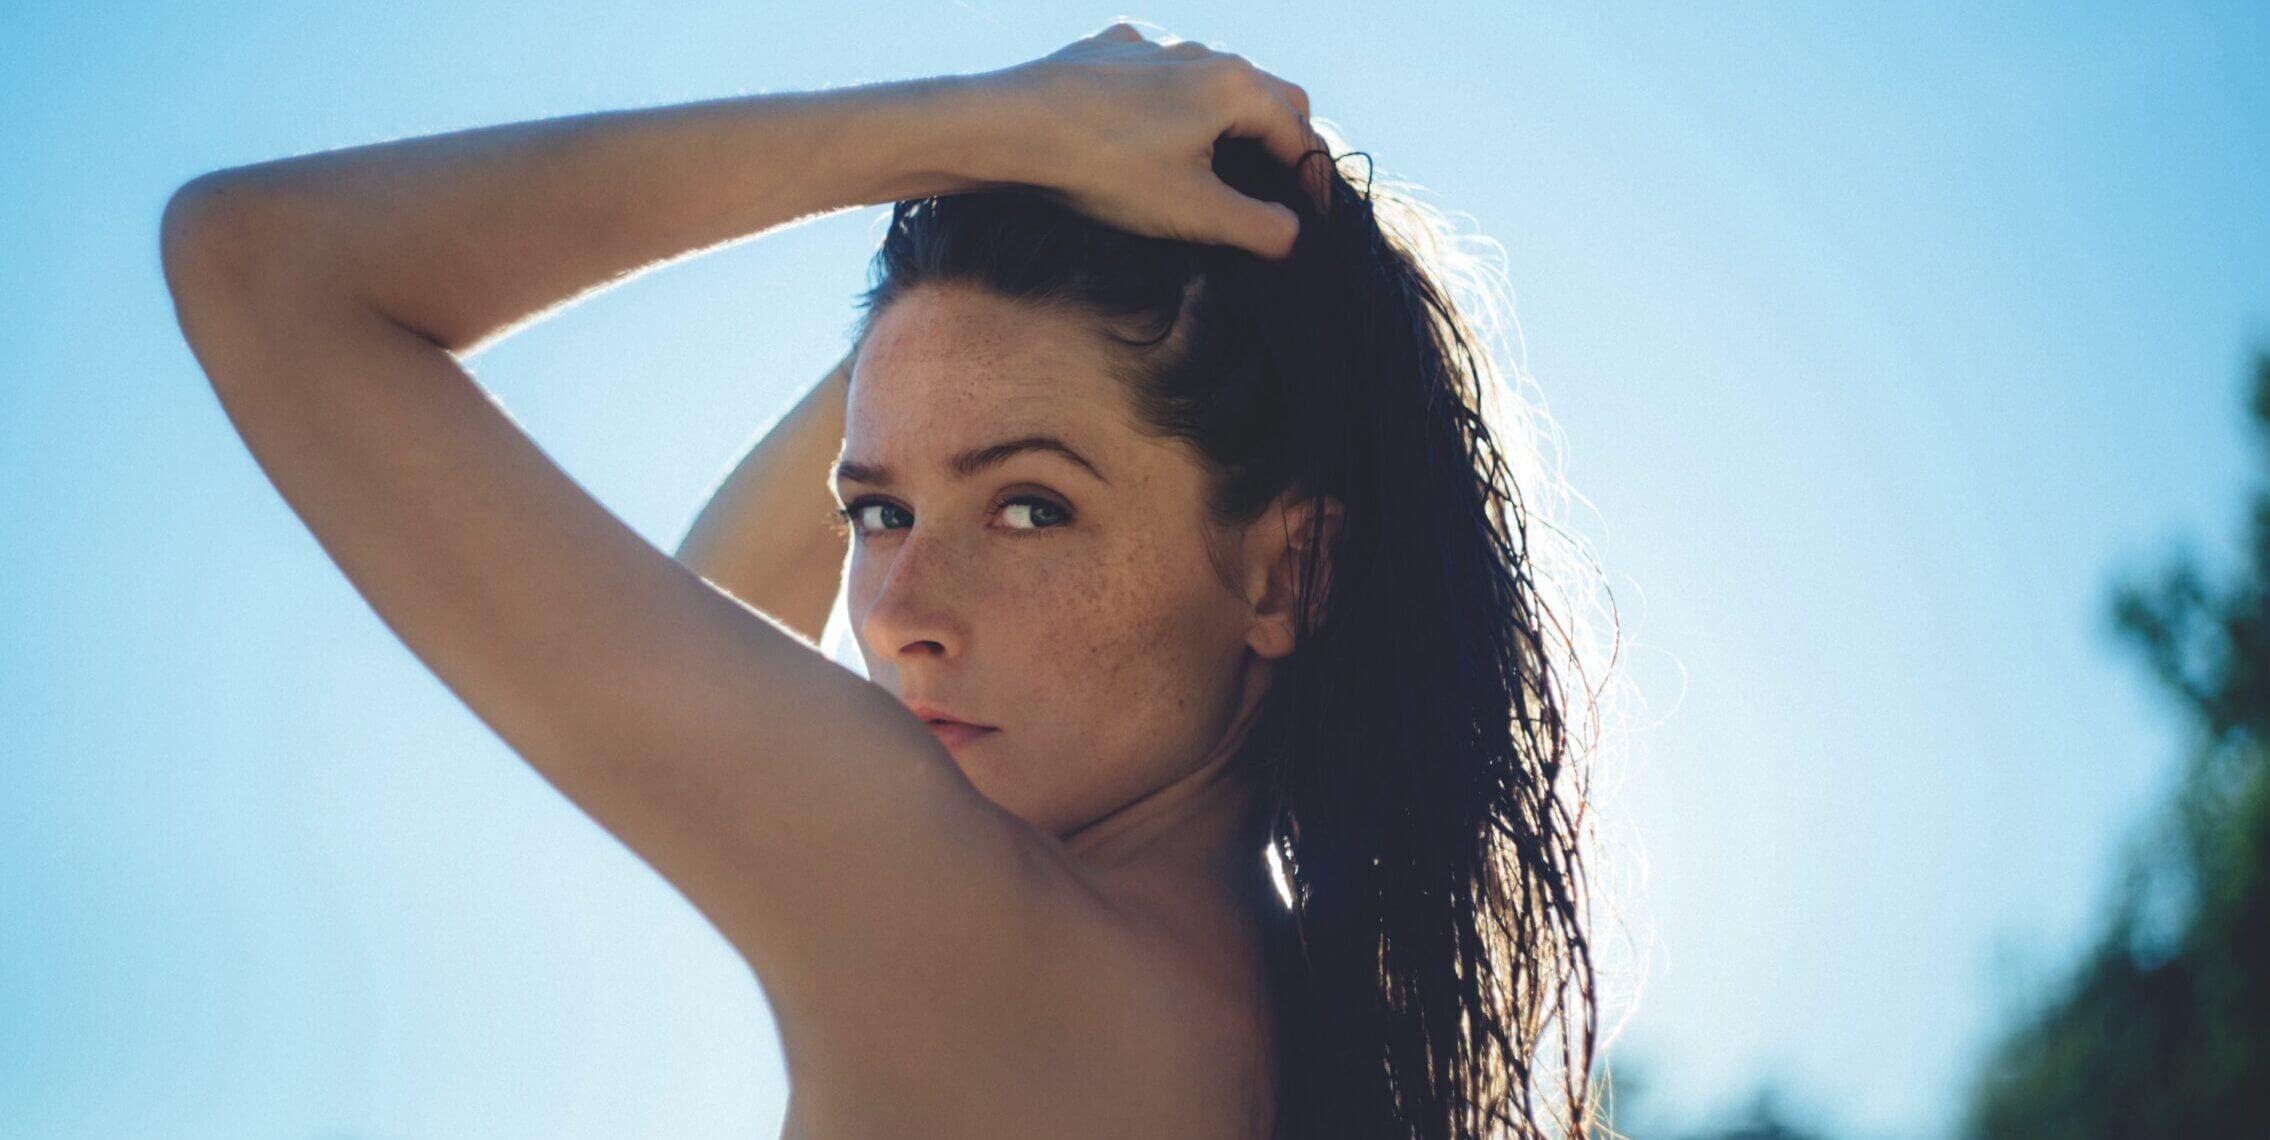 woman-posing-in-the-sunshine